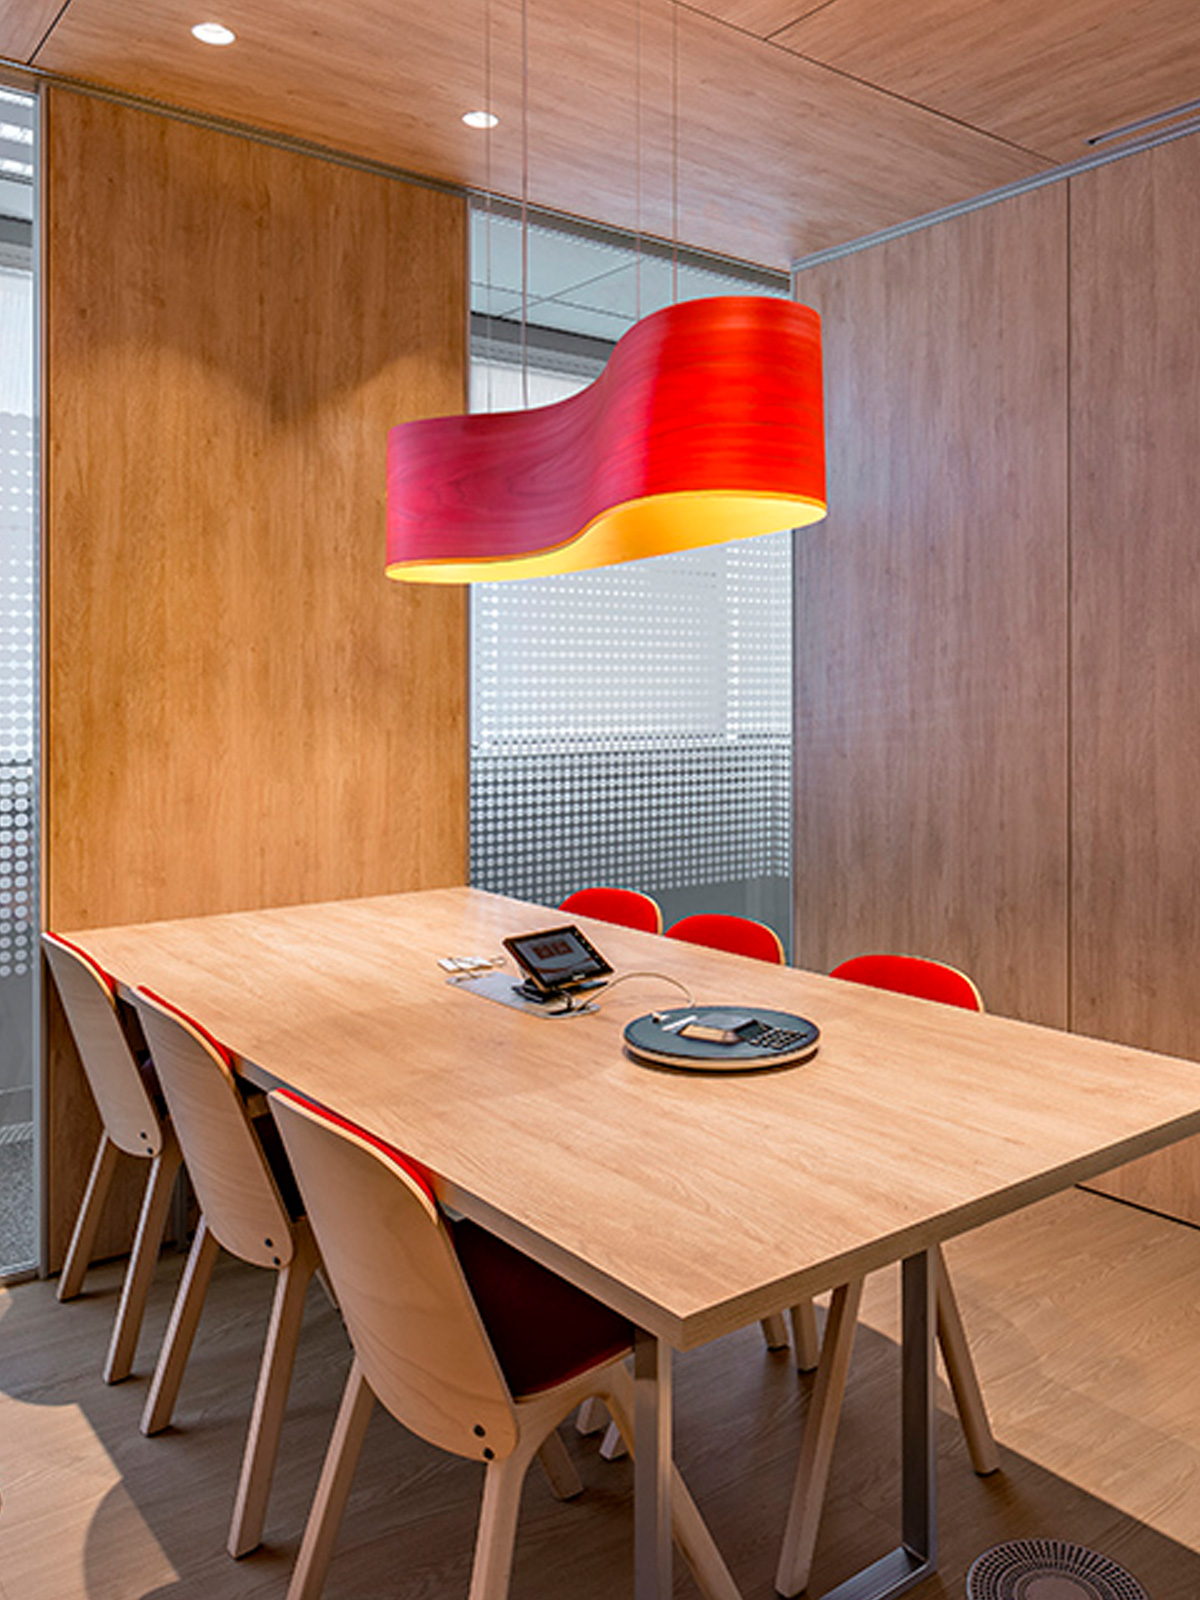 DesignOrt Blog: LZB Lampen Pendel Lampe New Wave von LZF im Büro